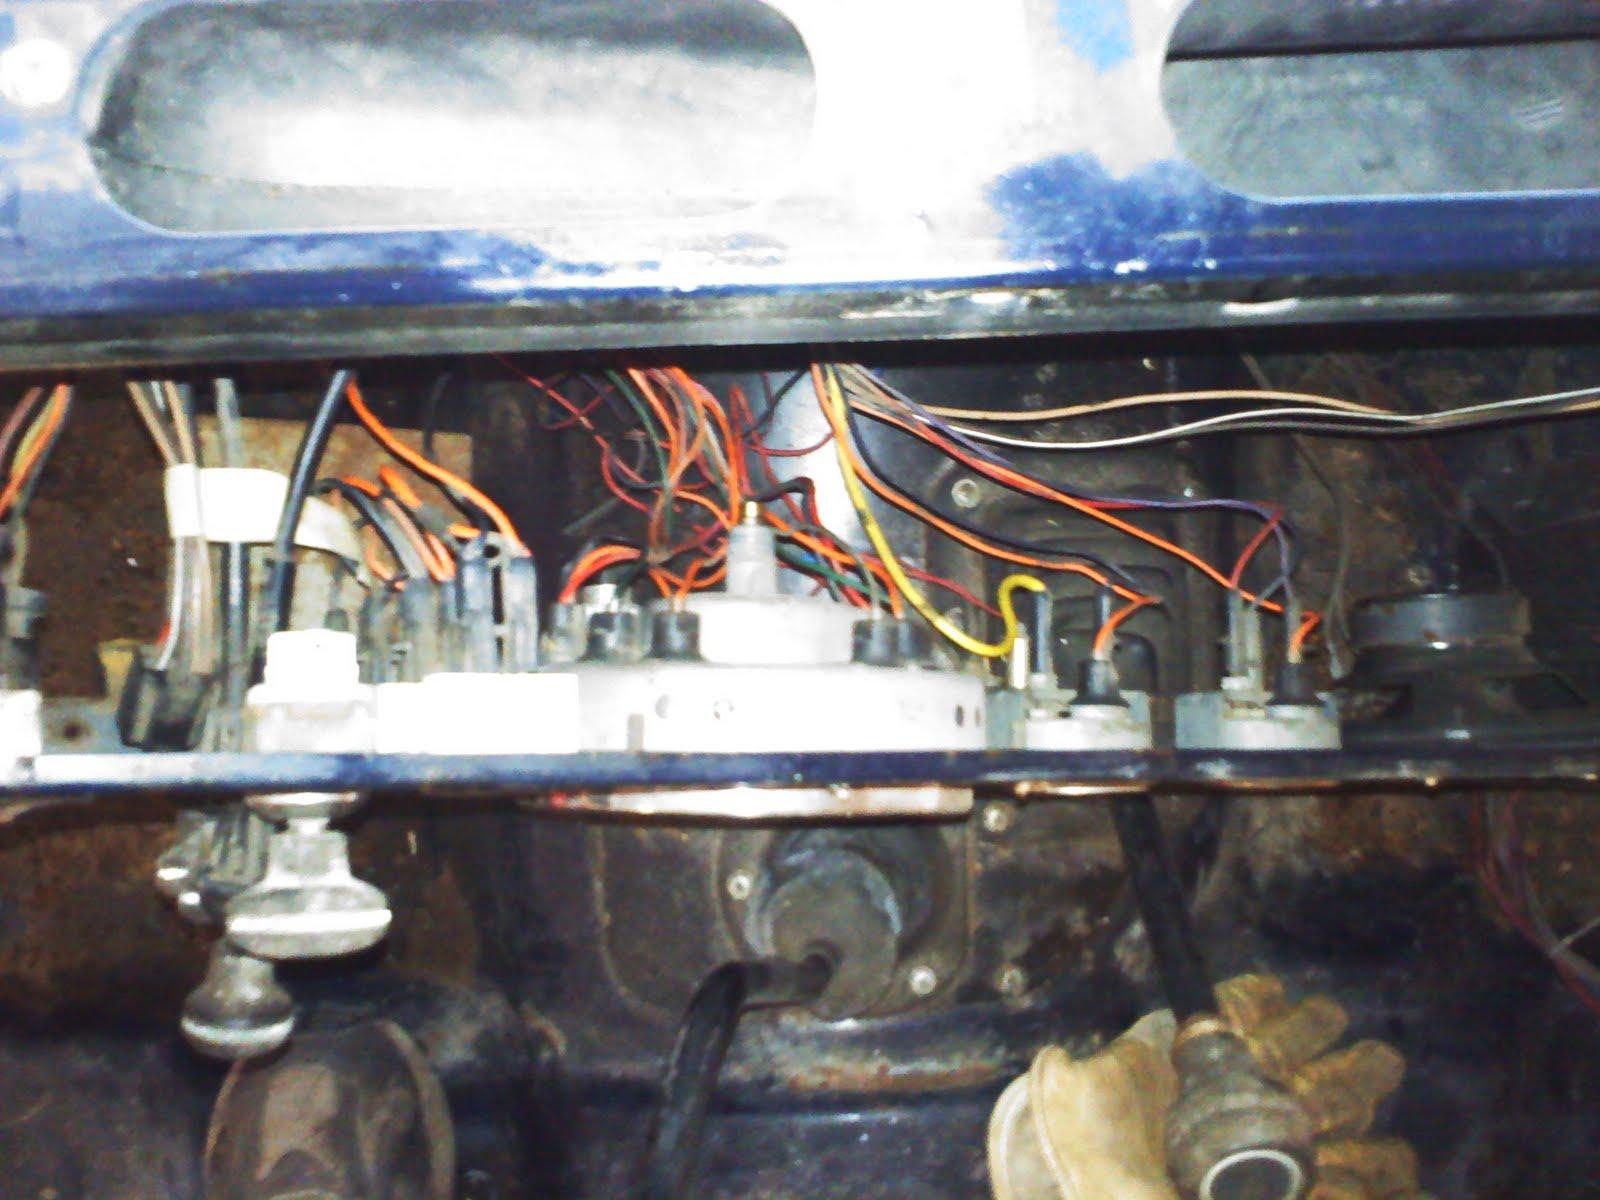 Wiring Diagram Jeep Cj7 Fuel Gauge Wiring Jeep Cj5 Dash Wiring Diagram